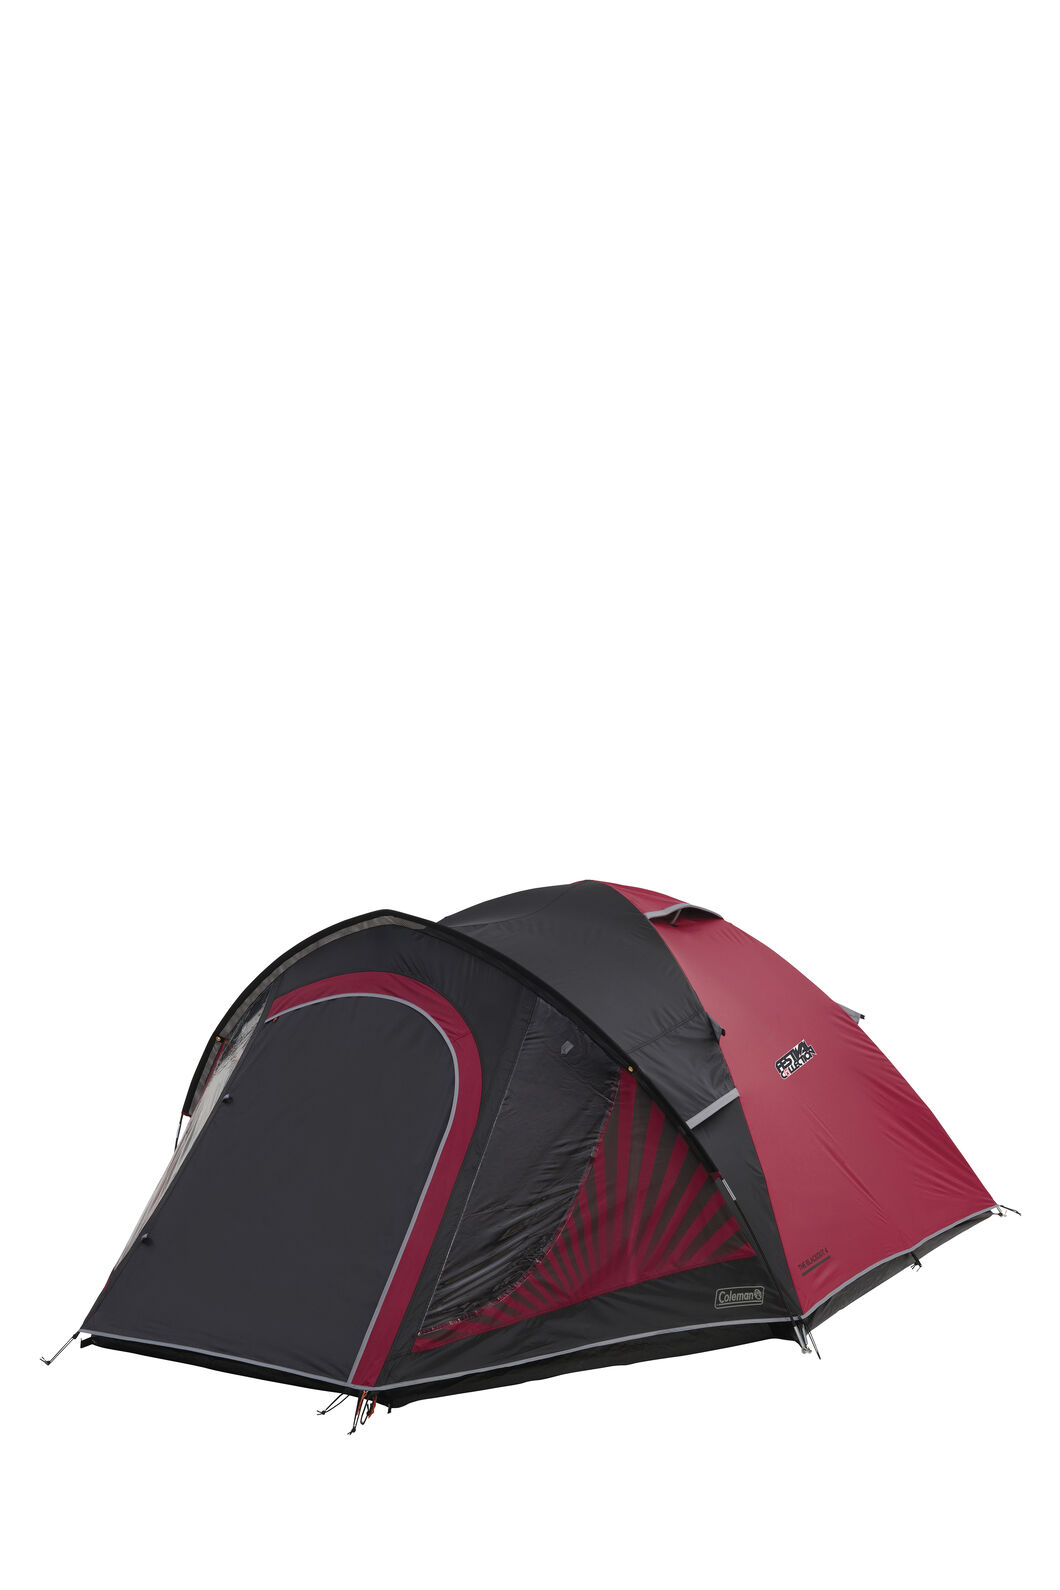 Coleman Blackout 4 Person Darkroom Tent, Black/Red, hi-res